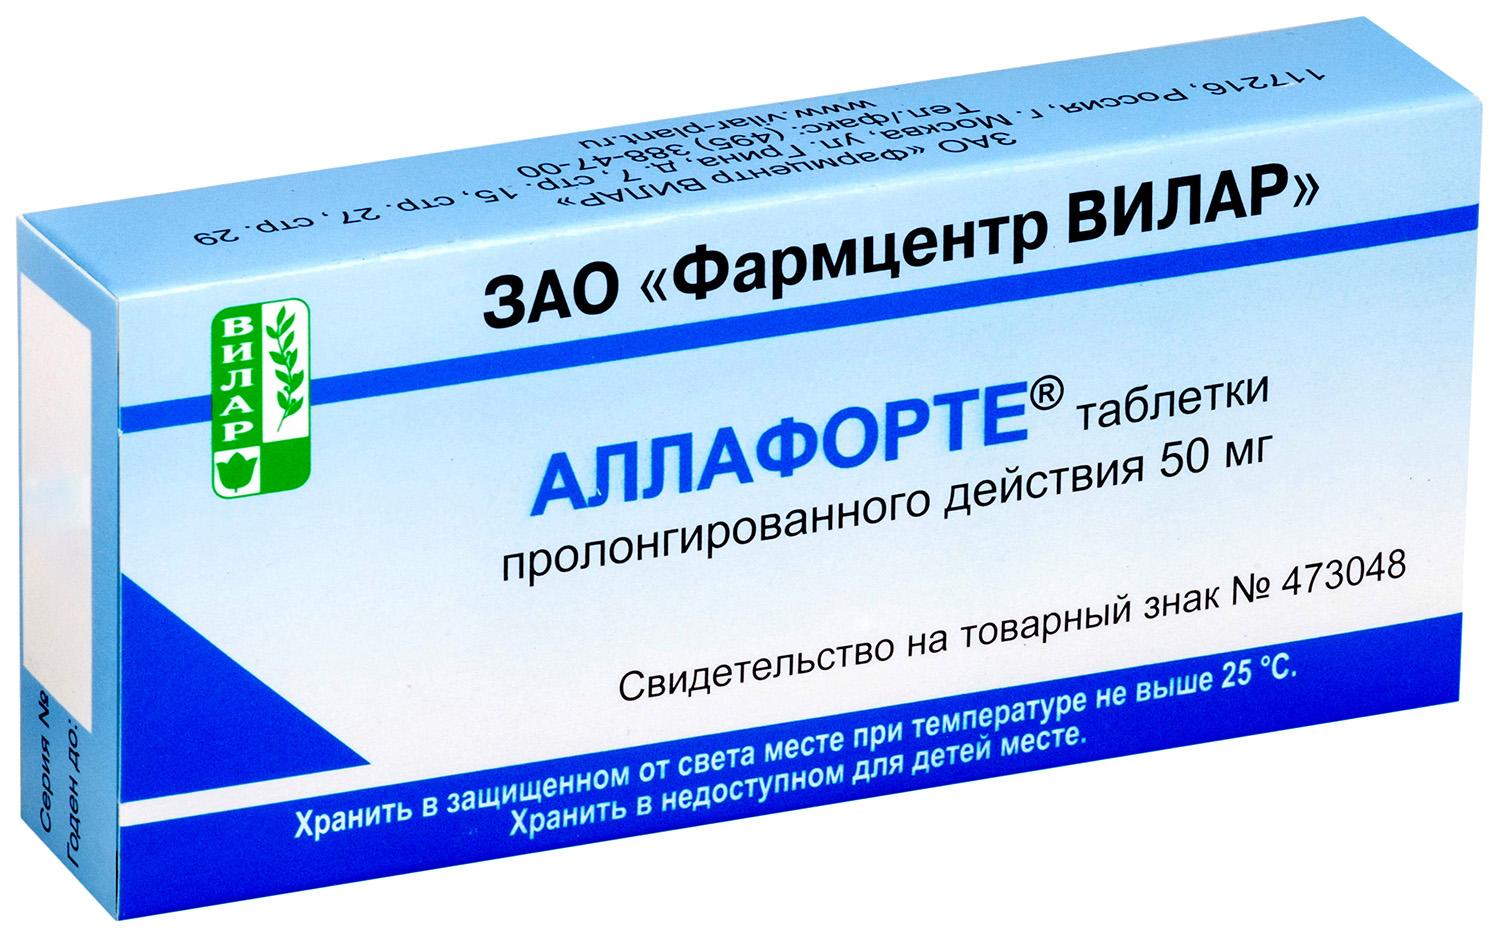 Аллафорте таблетки пролонг.дейст.50 мг 10 шт.